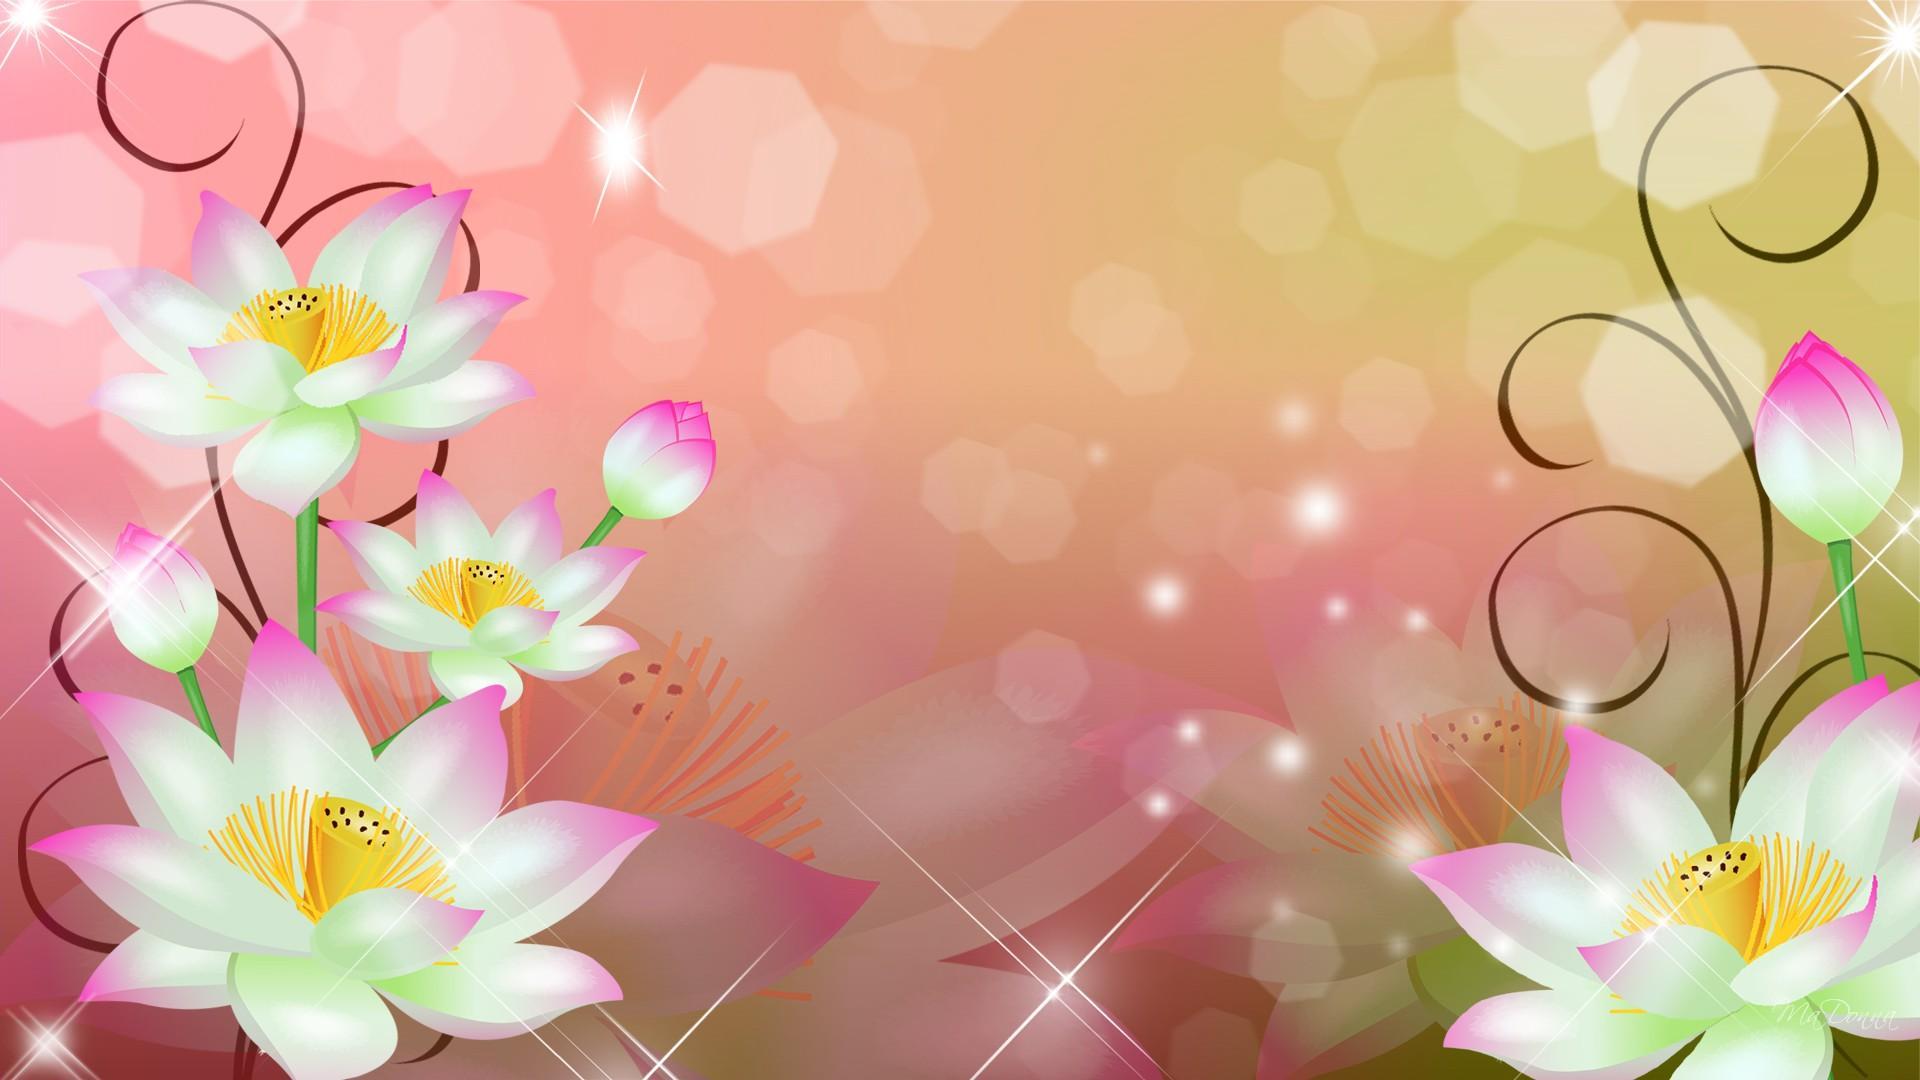 Flower Wallpaper Backgrounds Group (89+)